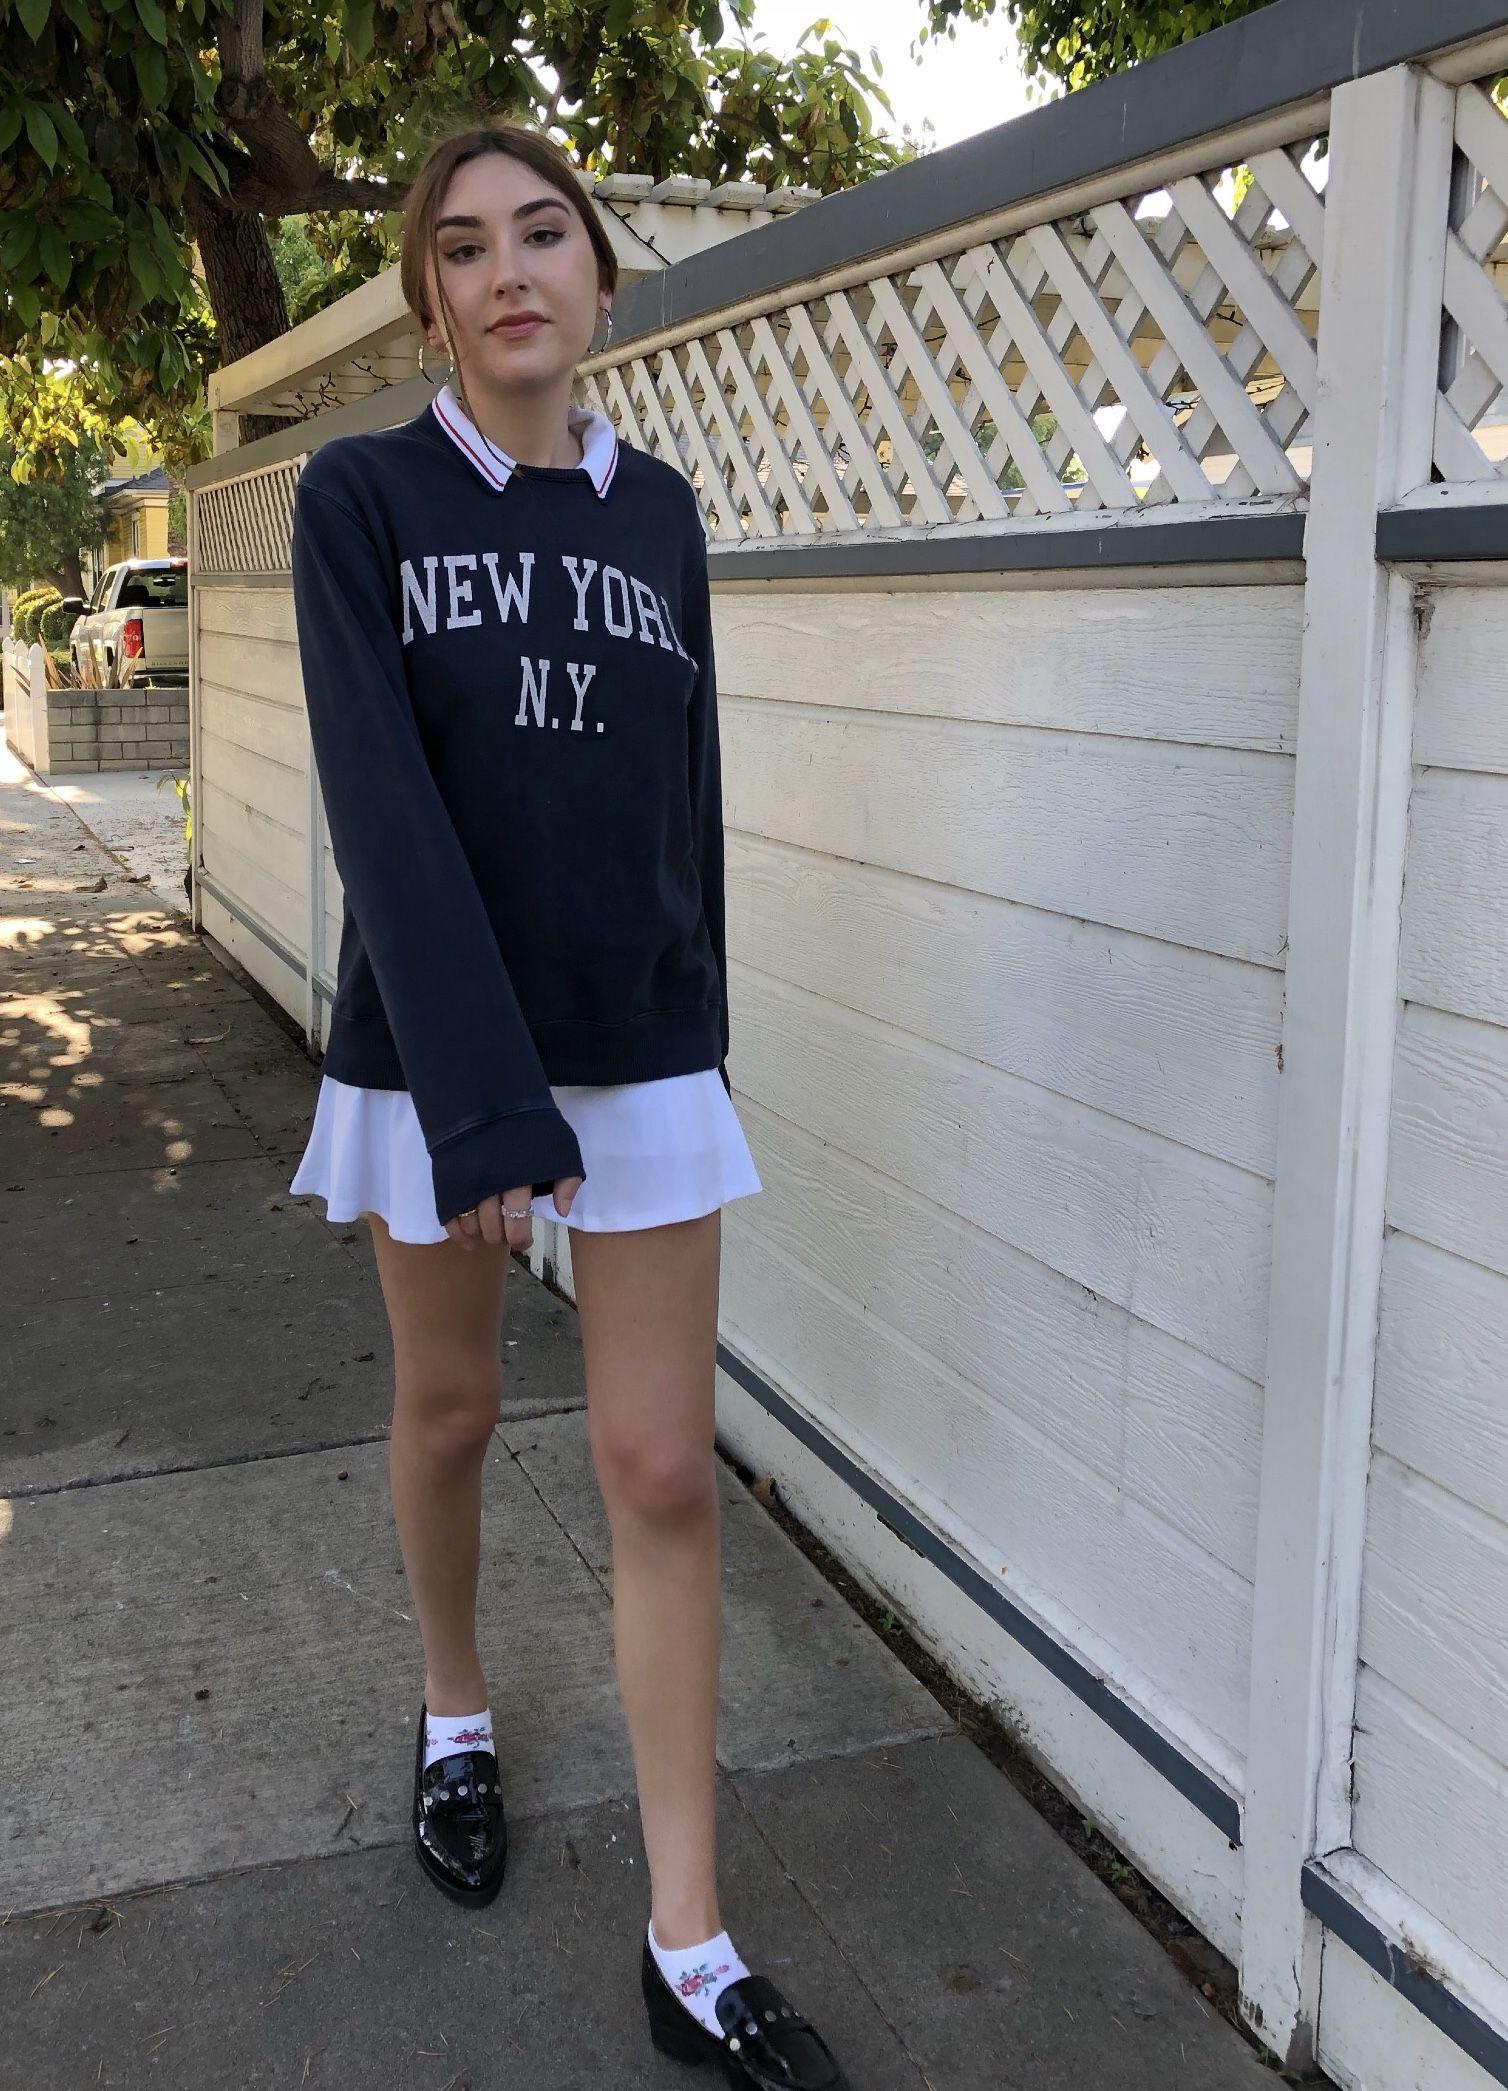 Brandymelville Y2k Preppy Indie Tennis Skirt White Navy Blue Golf Collar Polo Sweatshirt Paris Fren In 2020 Tennis Skirt Outfit Blue Sweatshirt Outfit Tennis Clothes